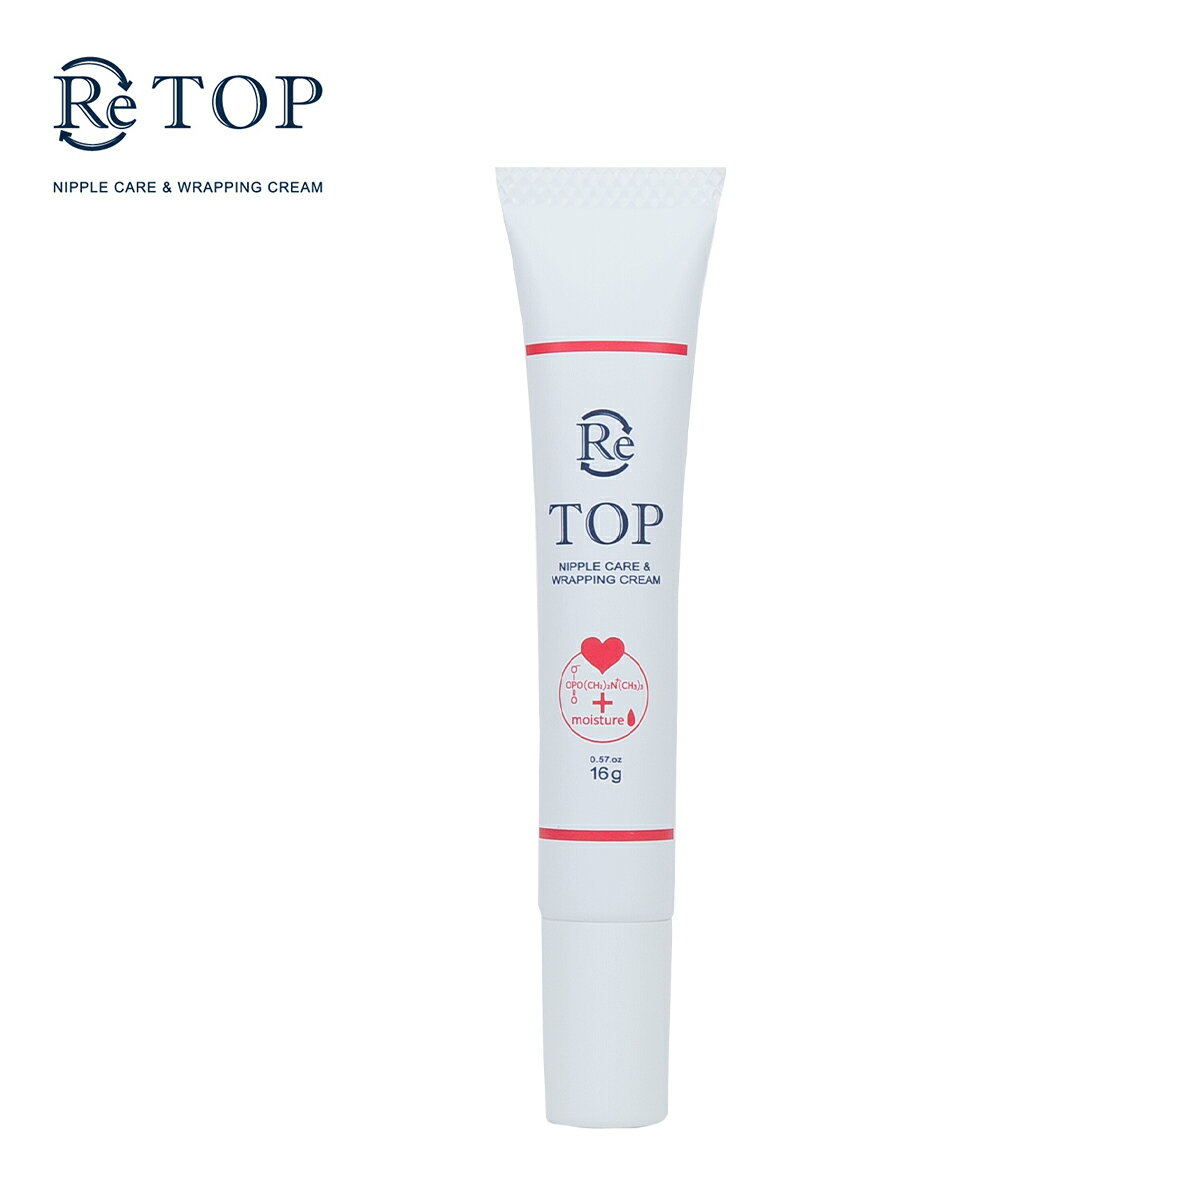 Re:TOP[リトップ/リピジュア配合]乳首かゆみ 乳首乾燥 バストトップ乾燥 乳首かゆい 乳首のかゆみ 乳首保湿 乳首ムズムズ 乳首コーティング ピュアプルウォーターのリピジュア配合 乳首保護